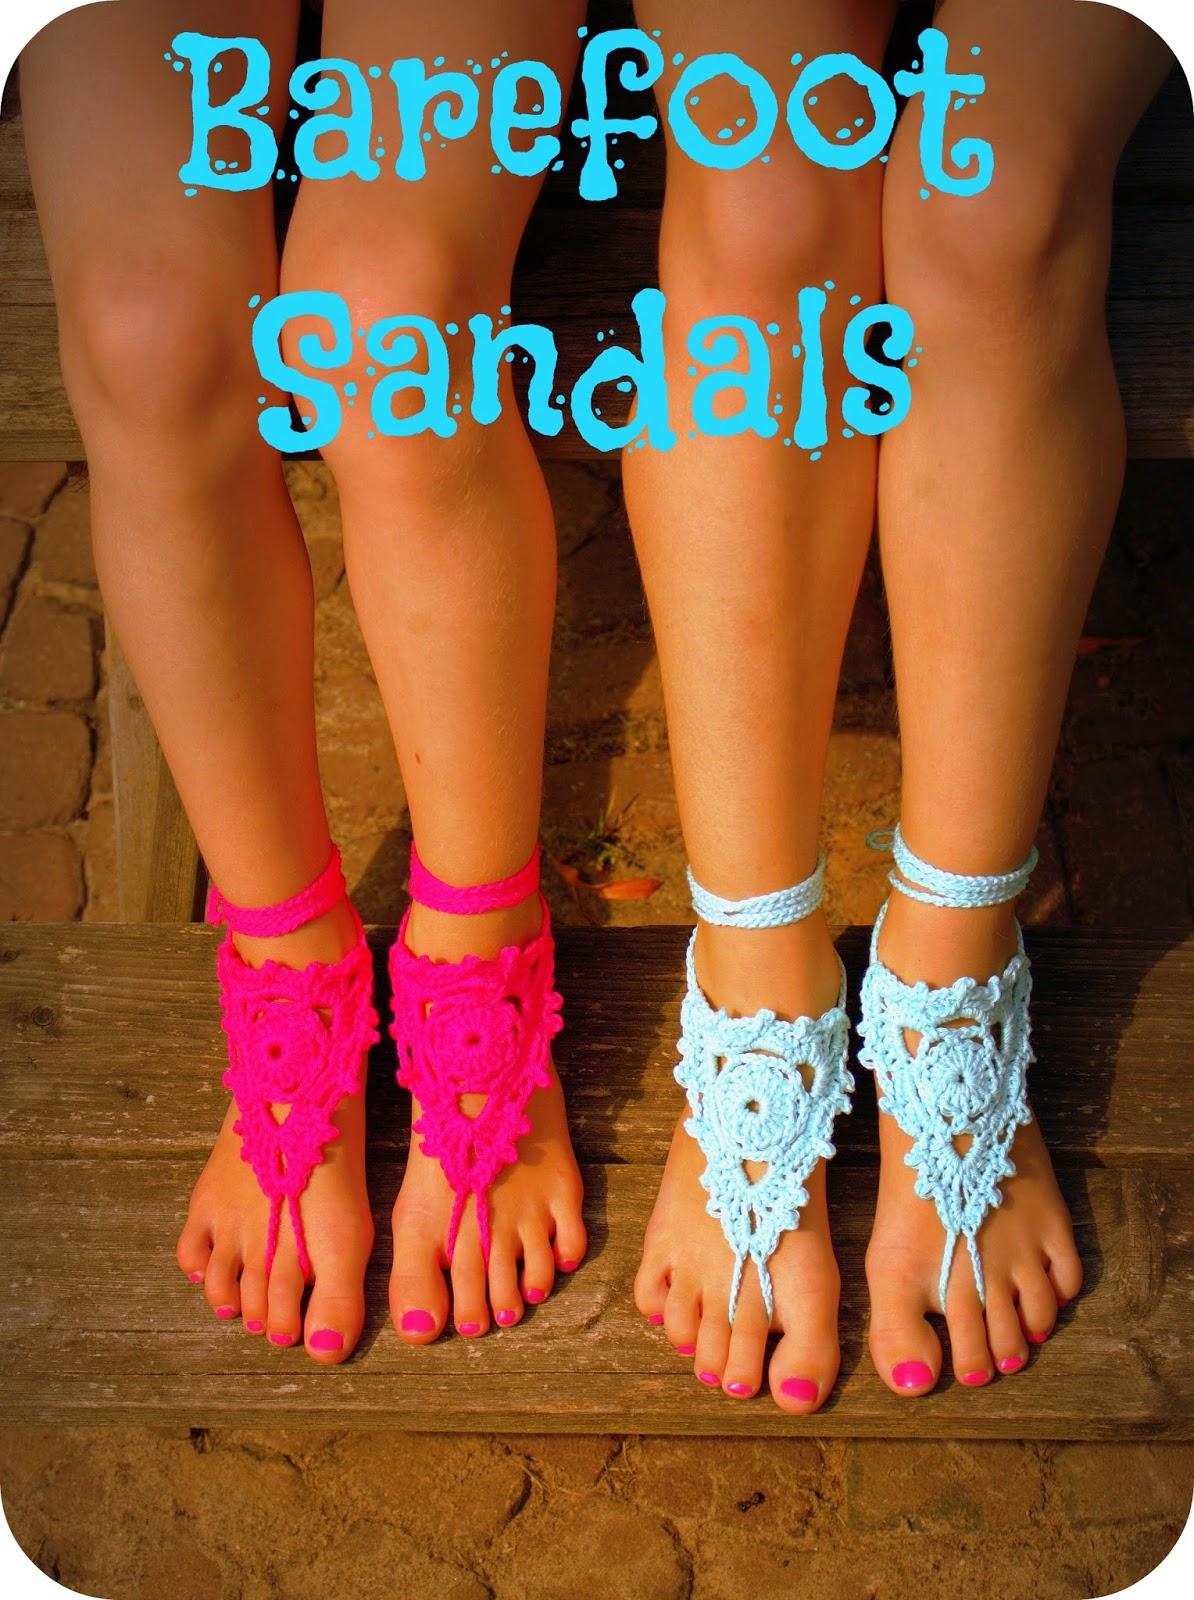 Beroemd HaakKamer7: Blote voeten sandalen / Barefoot Sandals @AI76